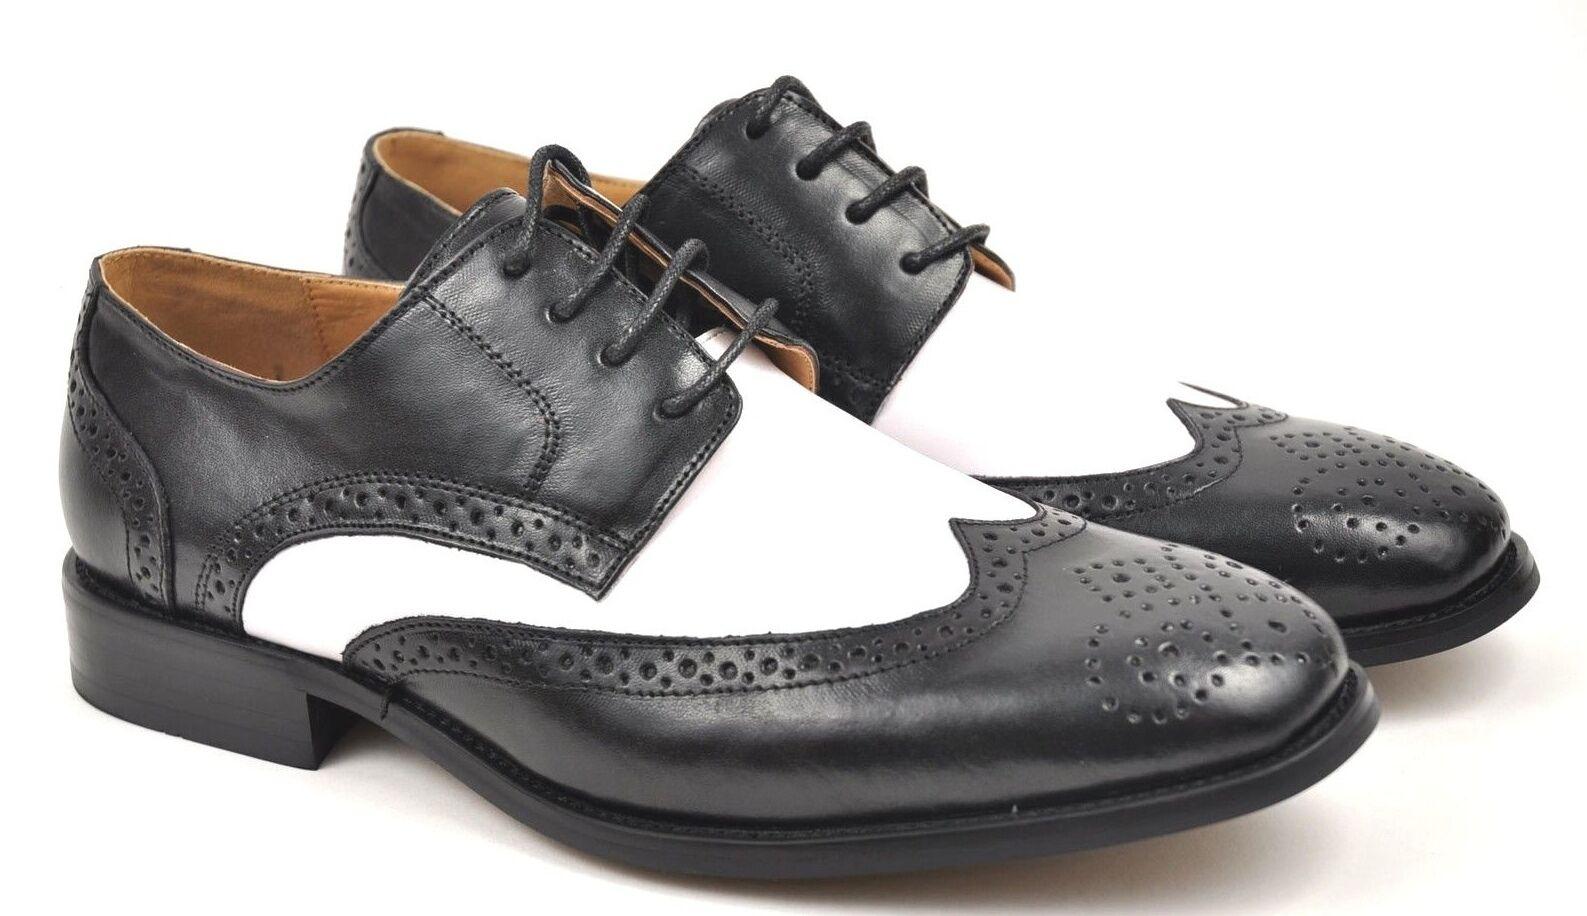 La Milano Tip Men's Black/White  Leather Wing Tip Milano Dress Shoes A590/F590 cba0d6